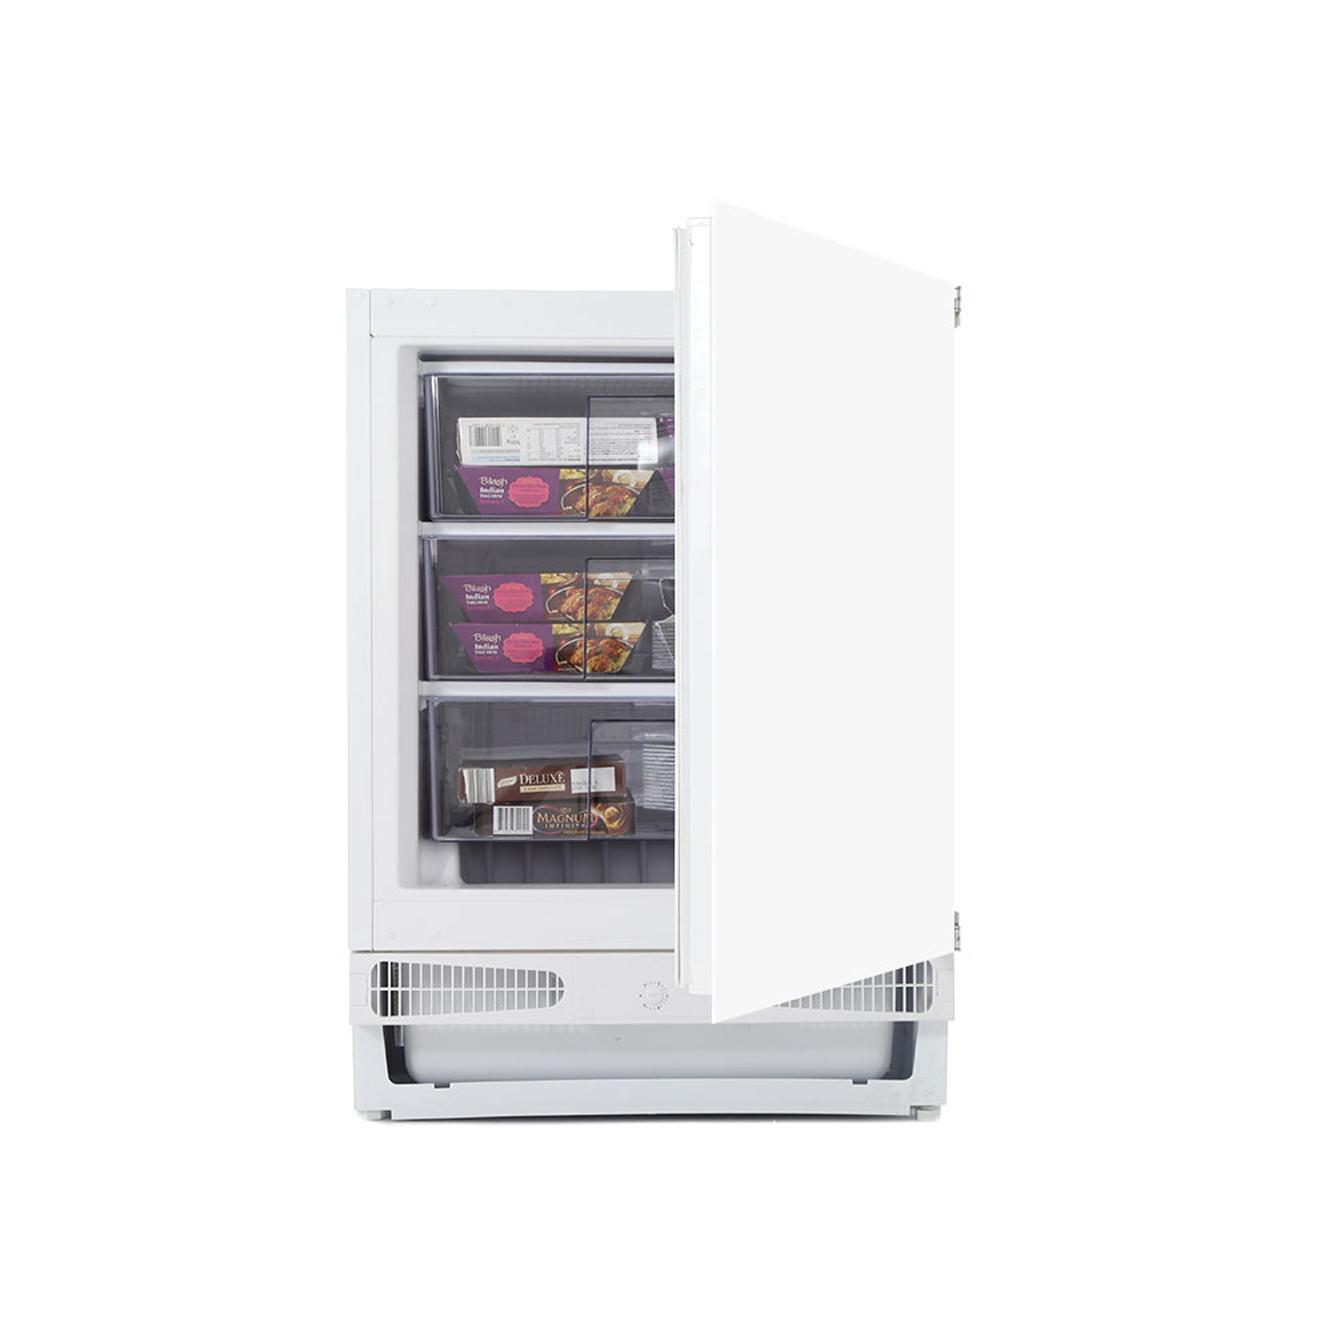 Iberna HUZ107.1 Built Under Freezer